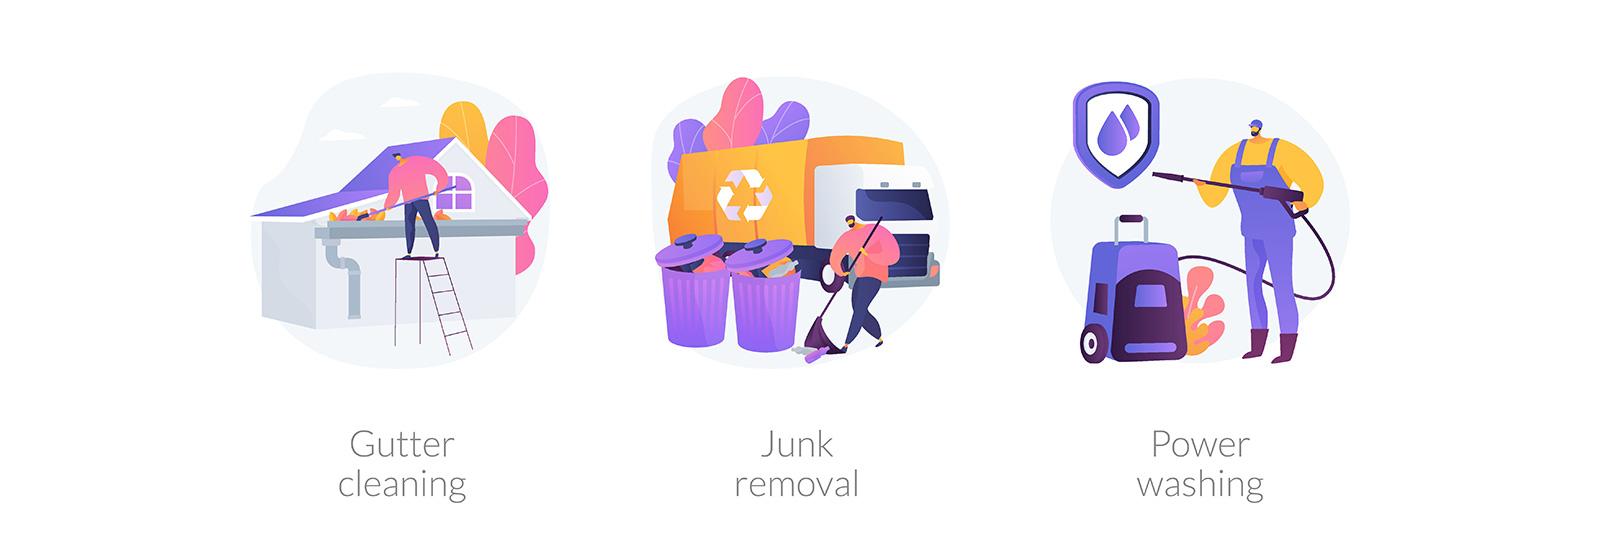 Junk/waste removals